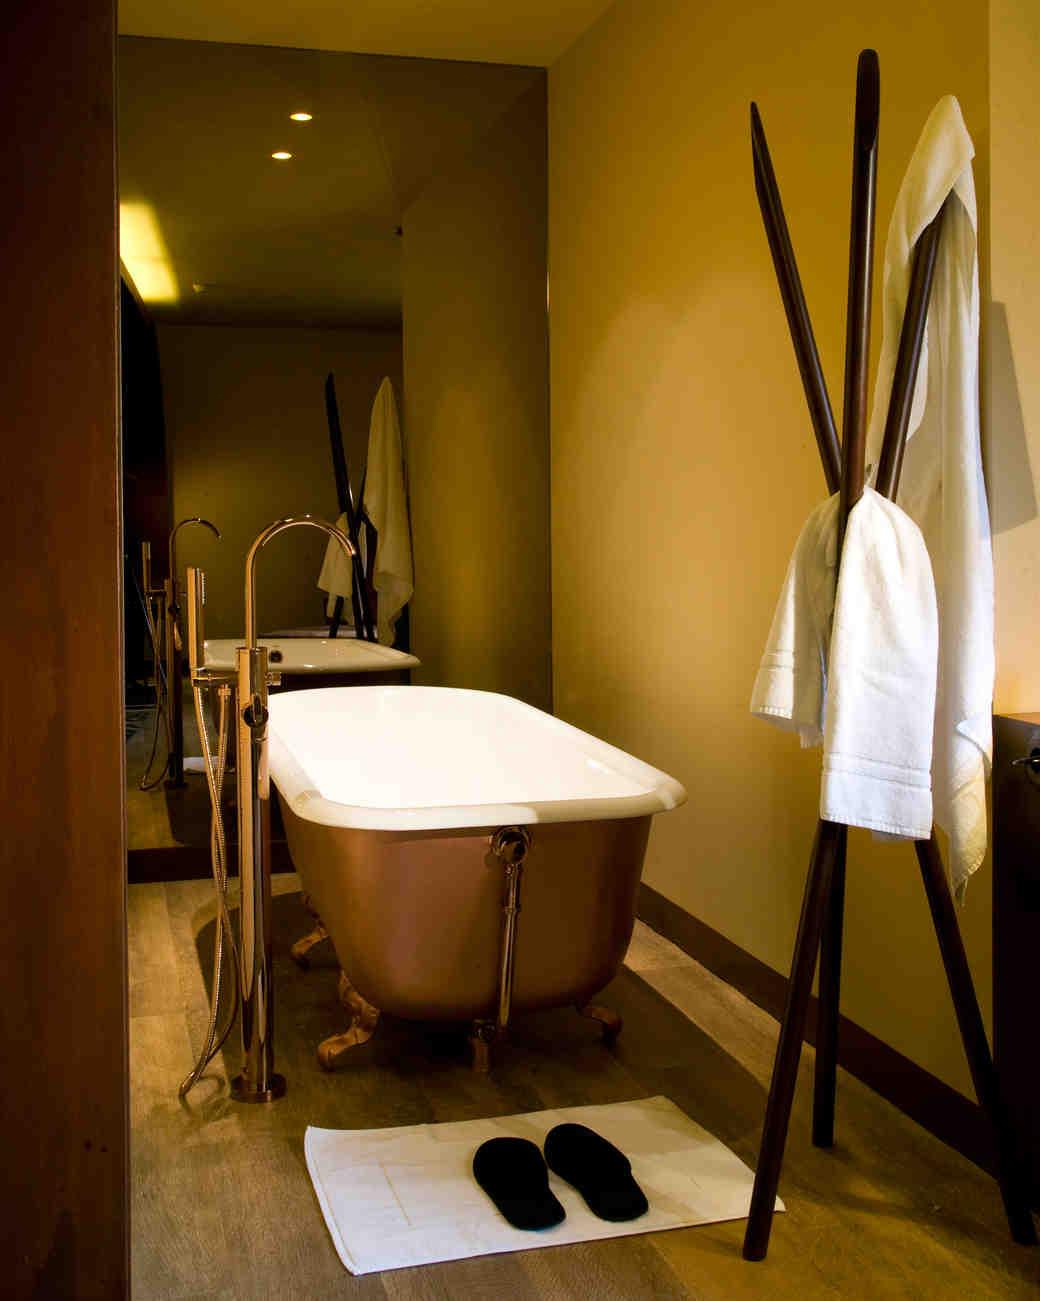 honeymoon-destinations-2015-portugal-hotel-teatro-0115.jpg